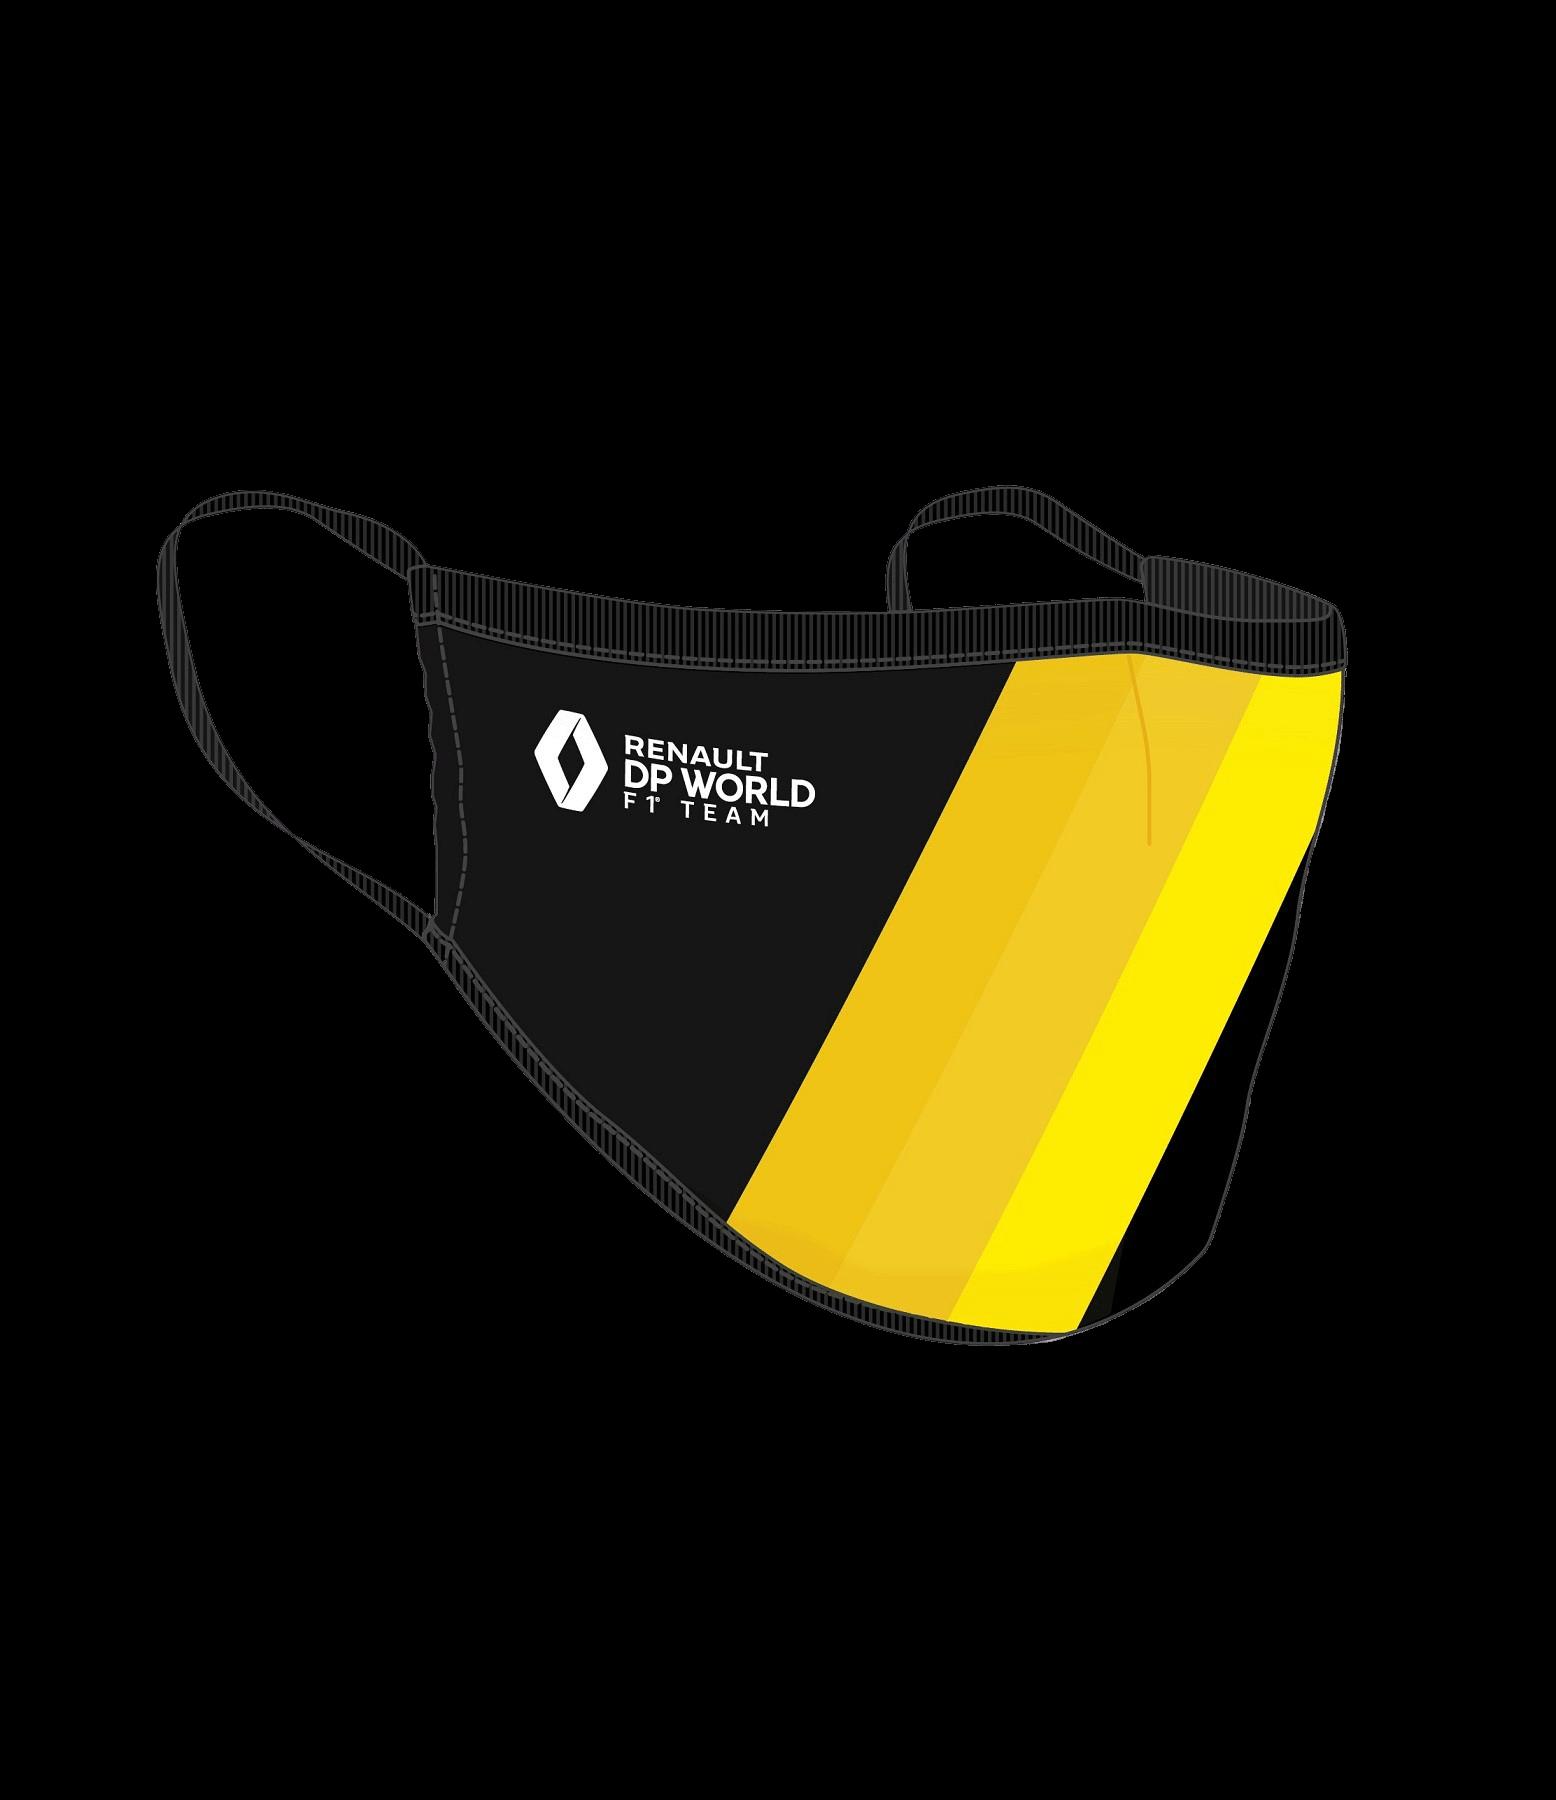 RENAULT DP WORLD F1 TEAM Fabric Mask - black & Yellow